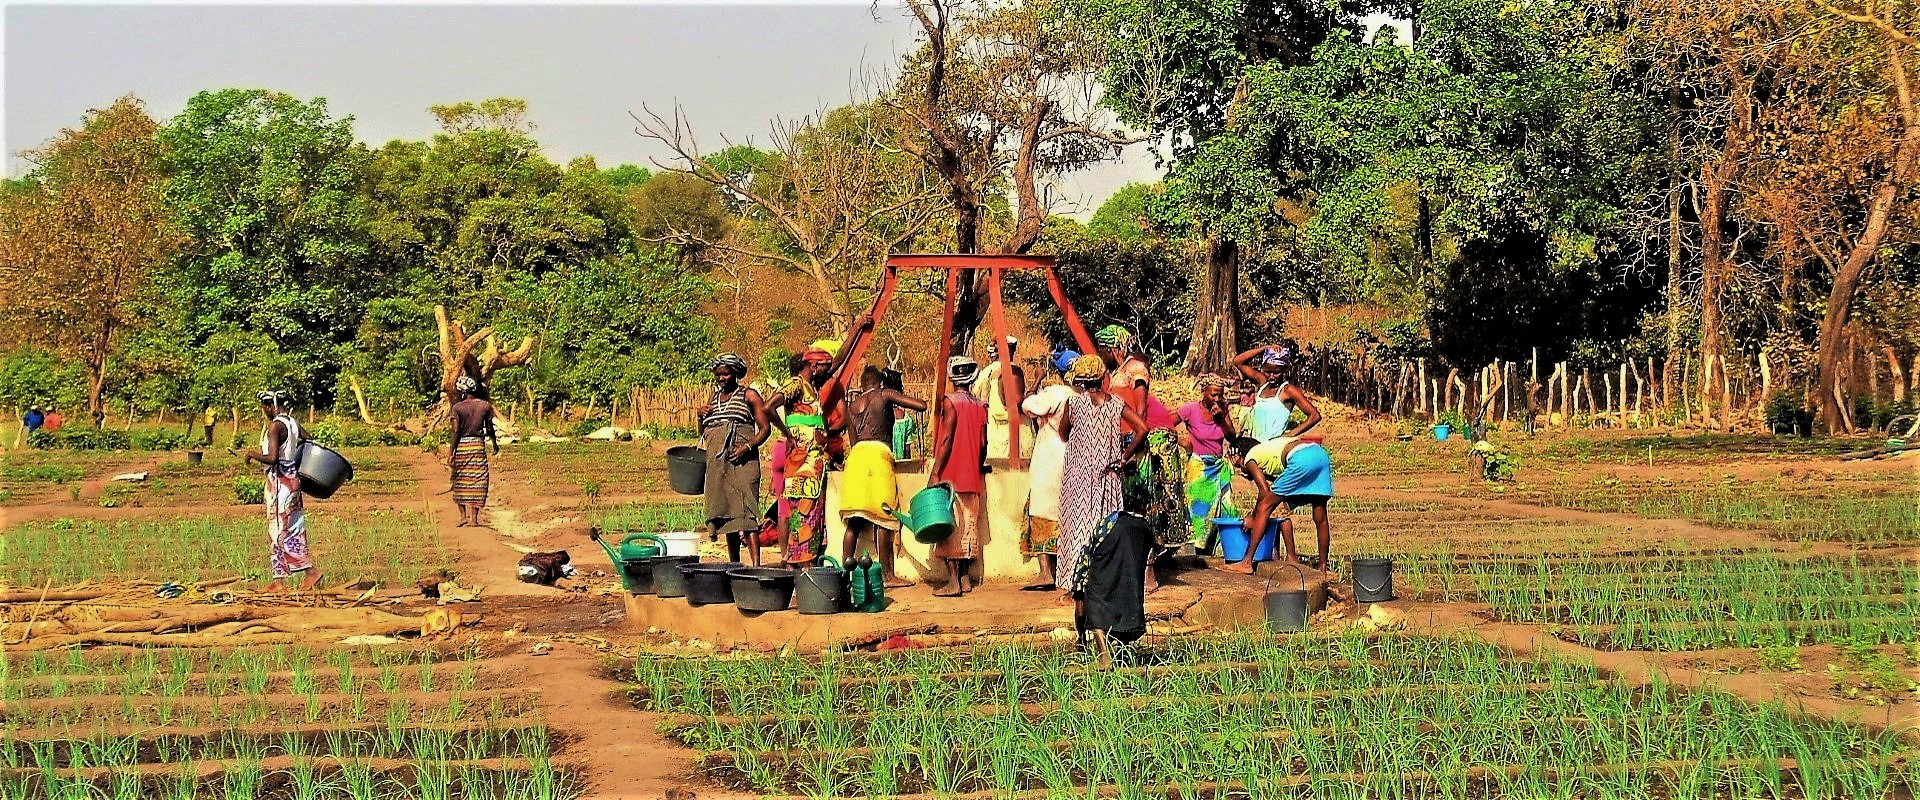 Pozzo_Campi_Donne_Guinea_Bissau_Mani_Tese_2017